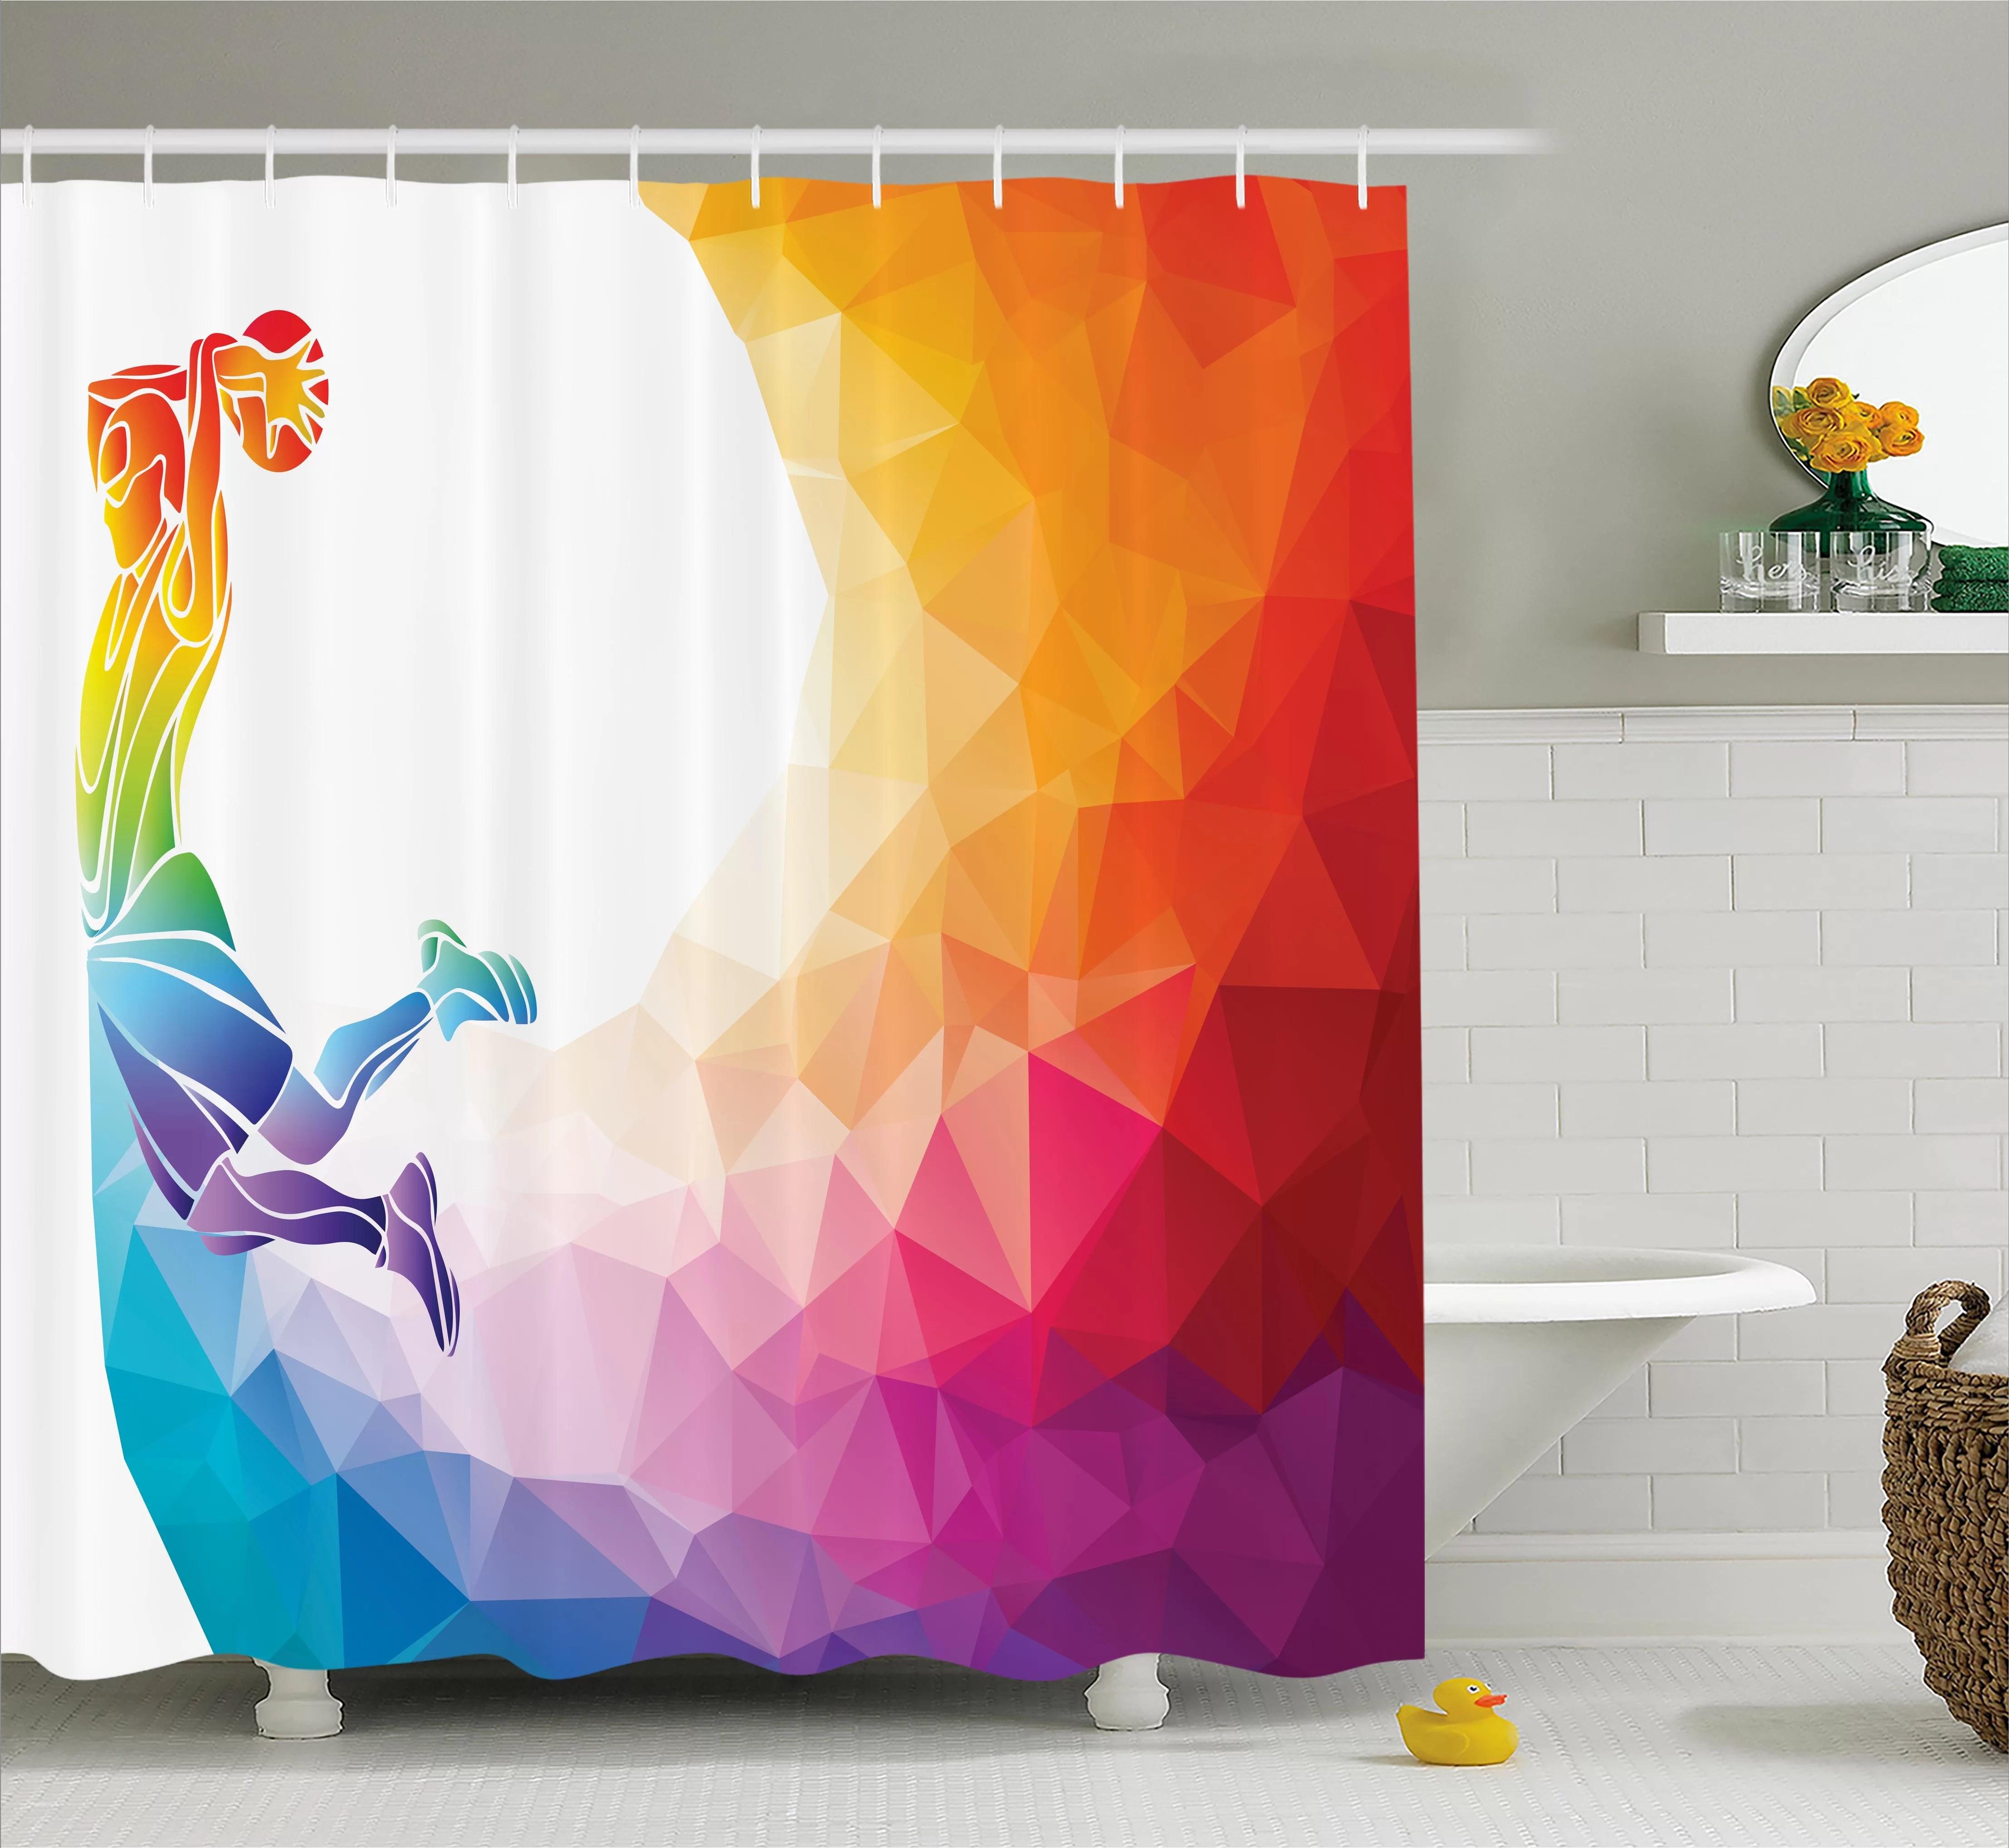 ebern designs kara rainbow coloured theme with a basketball player sports man jumps print single shower curtain wayfair ca